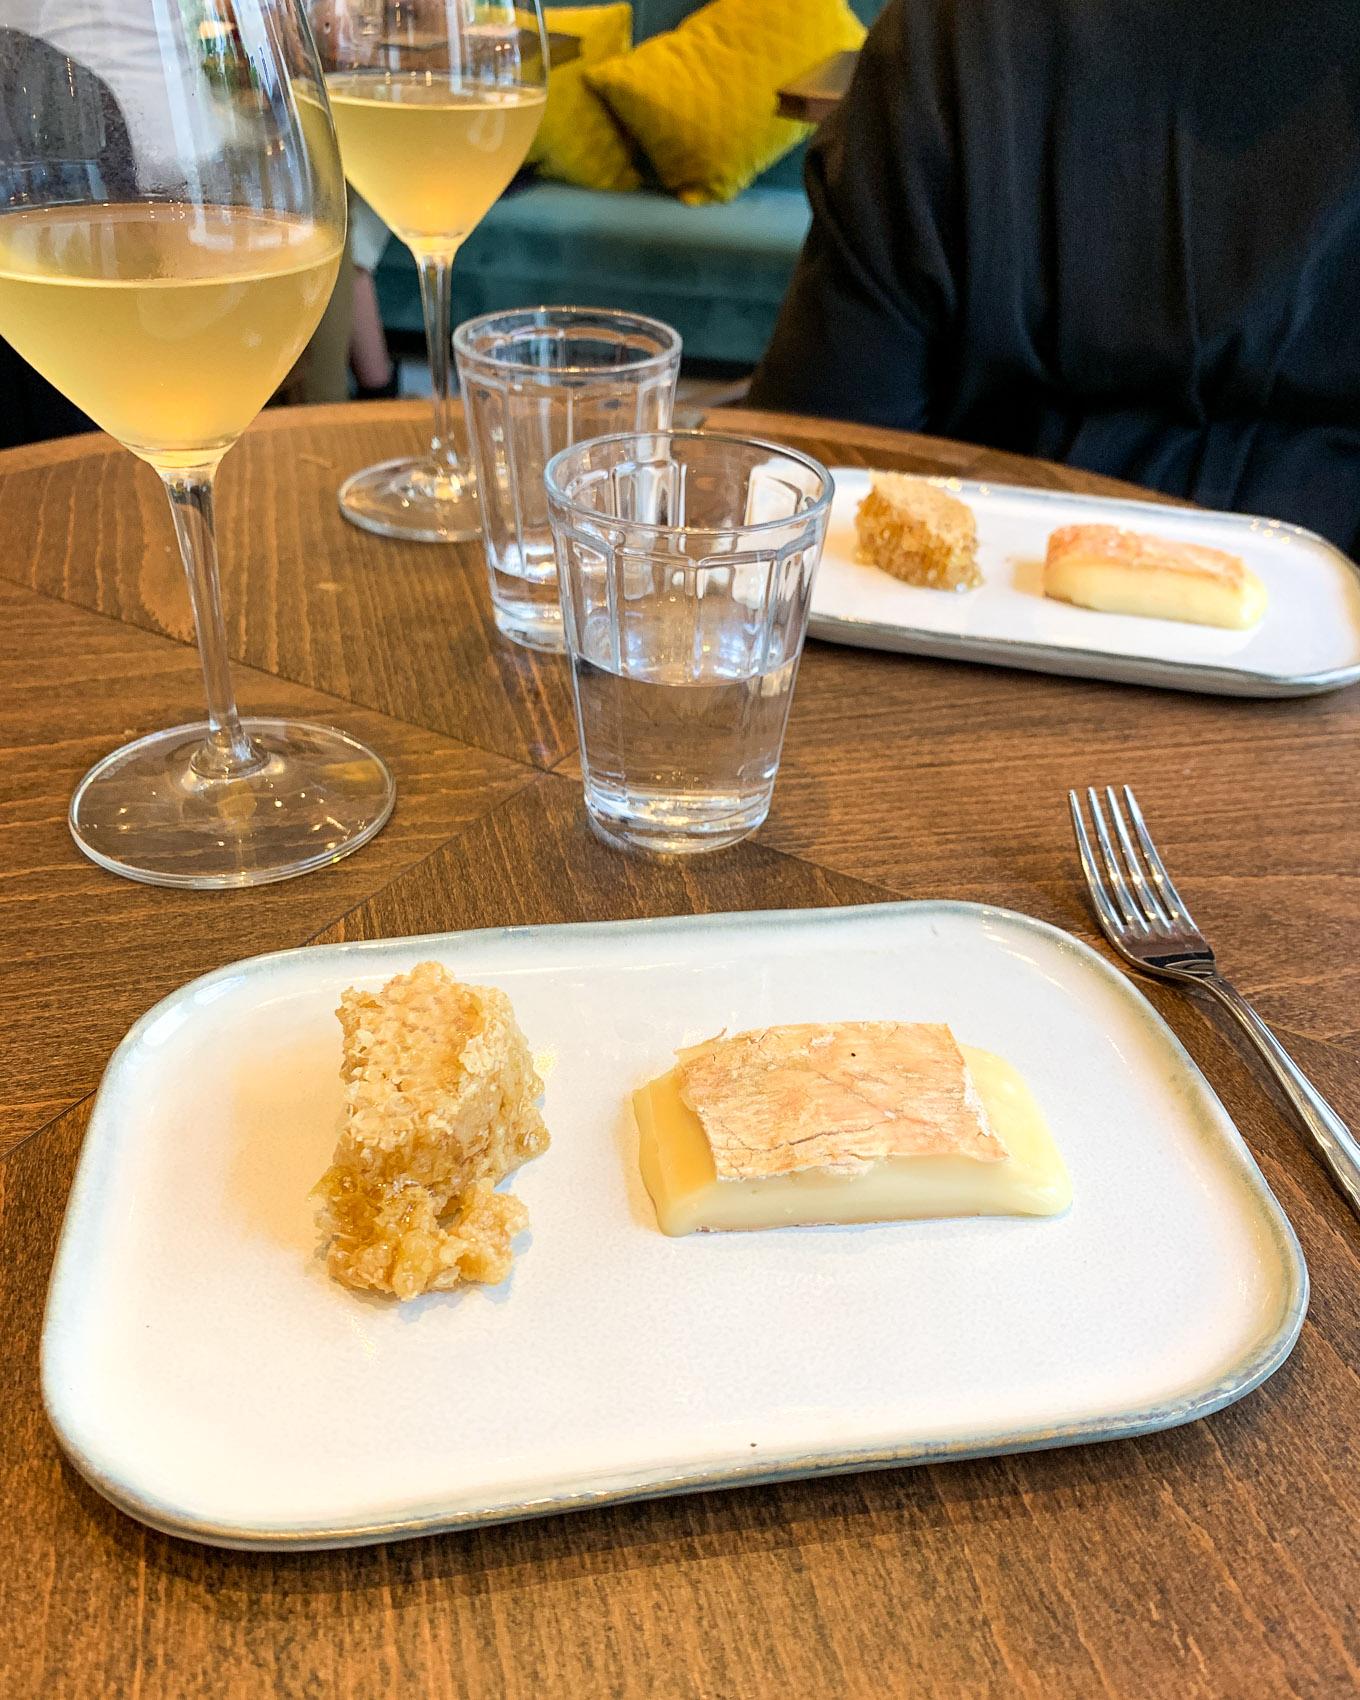 Ravintola Sikke's